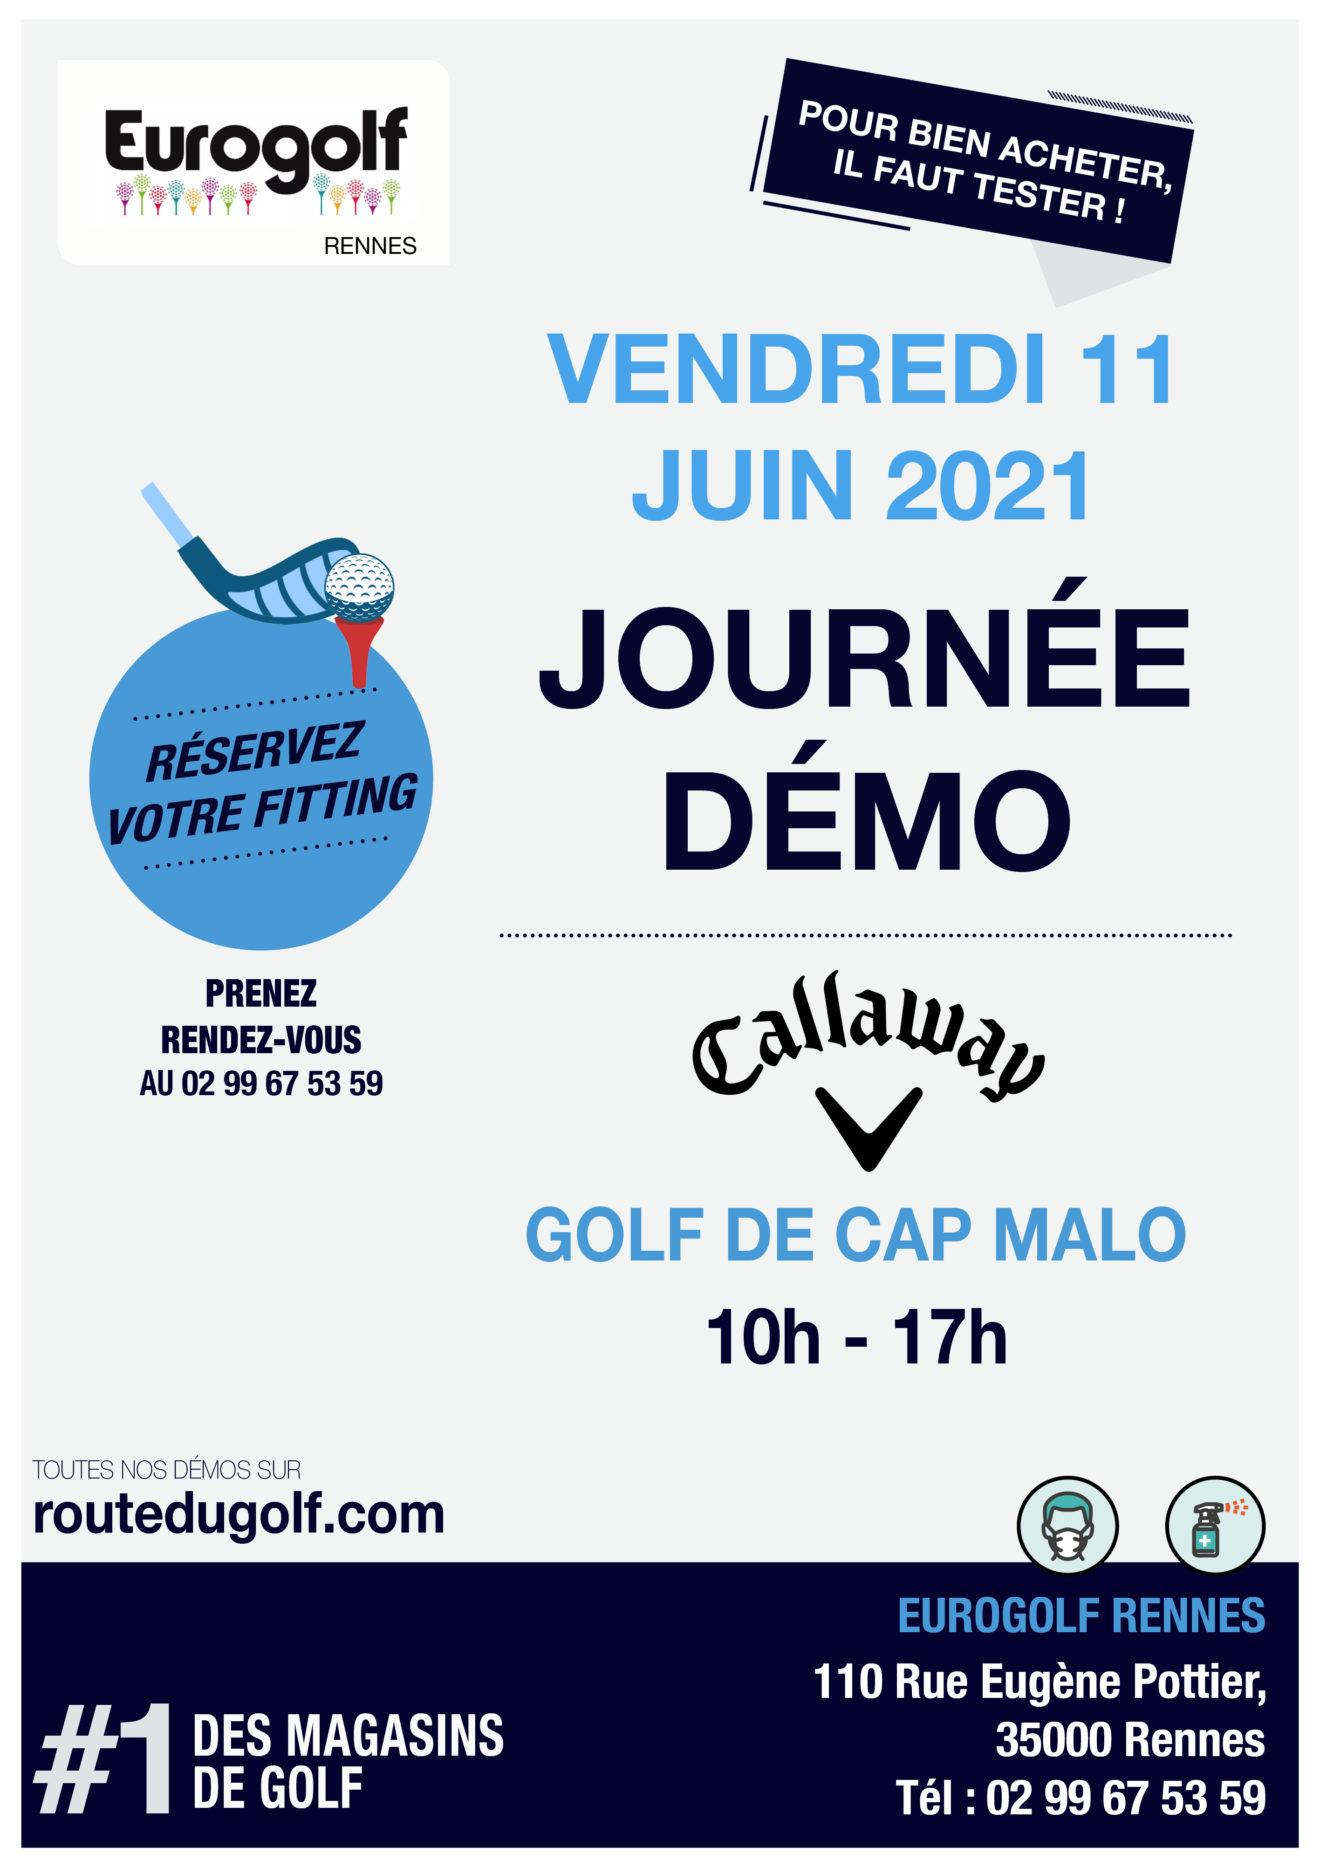 Démo_Rennes_Callaway_11_06